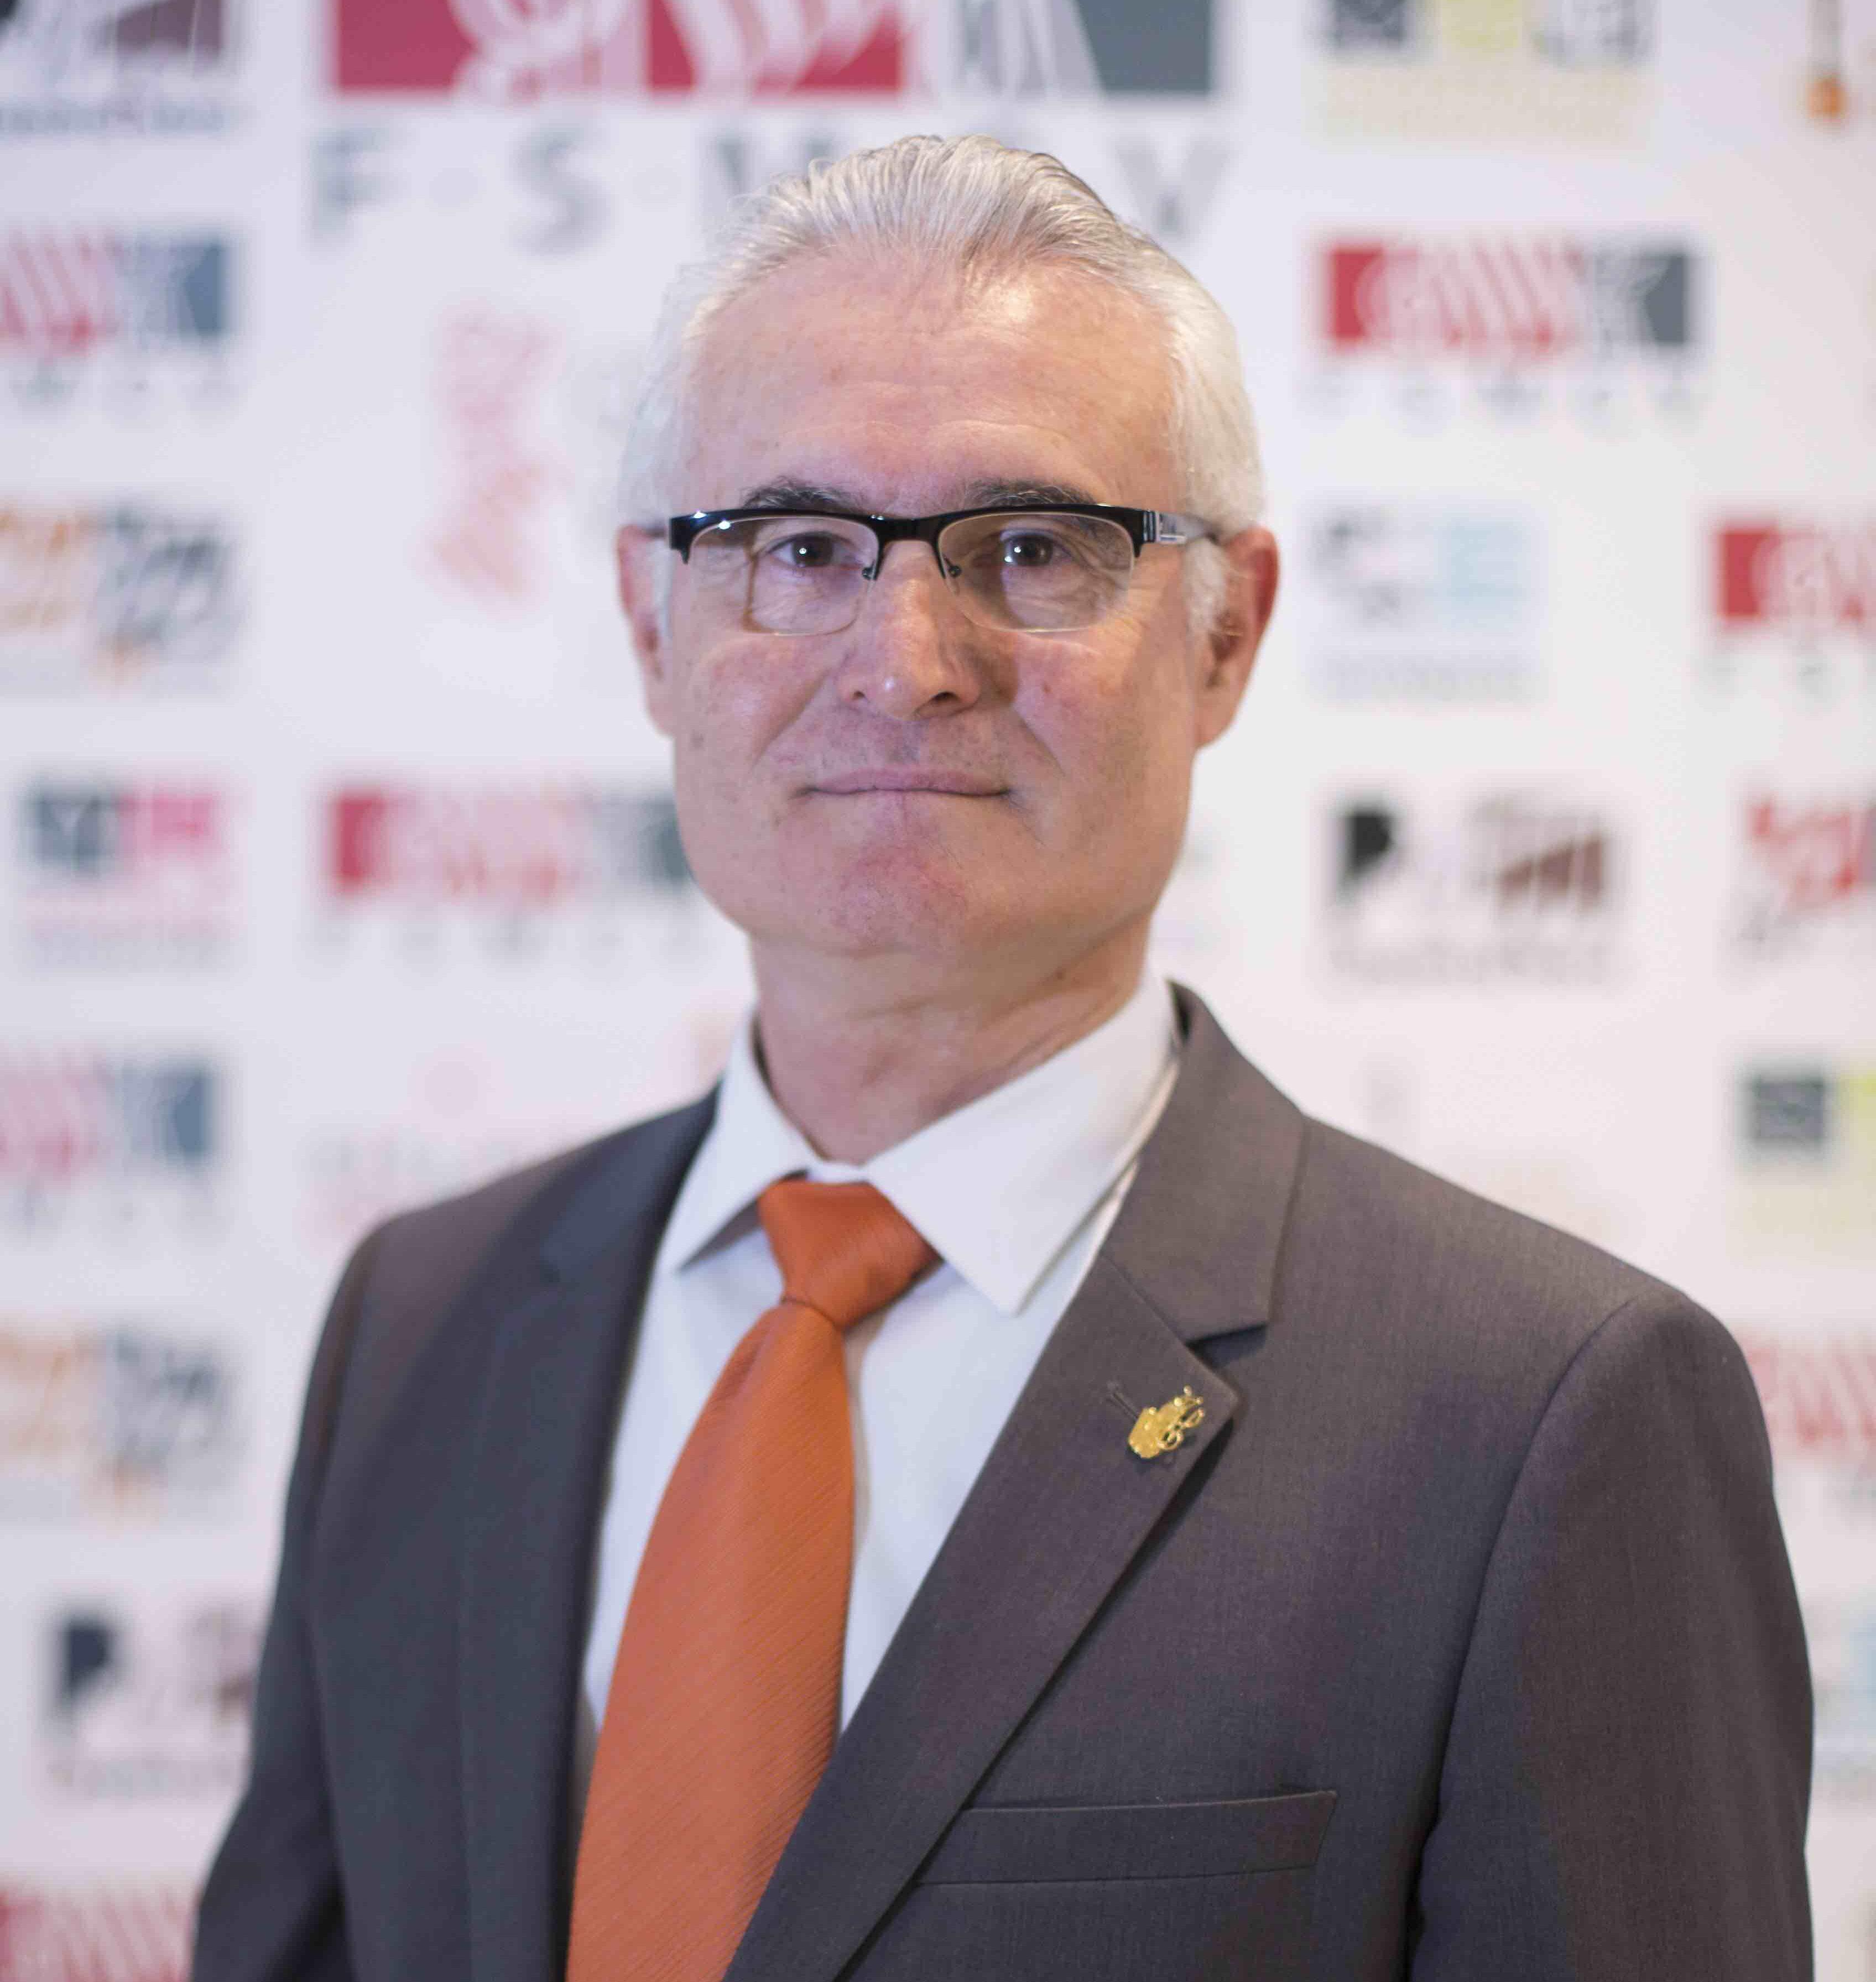 Antoni Aliaga, que ha recibido el 95% de los votos, pertenece desde 2001 a la Societat Artistica Musical d'Alginet.